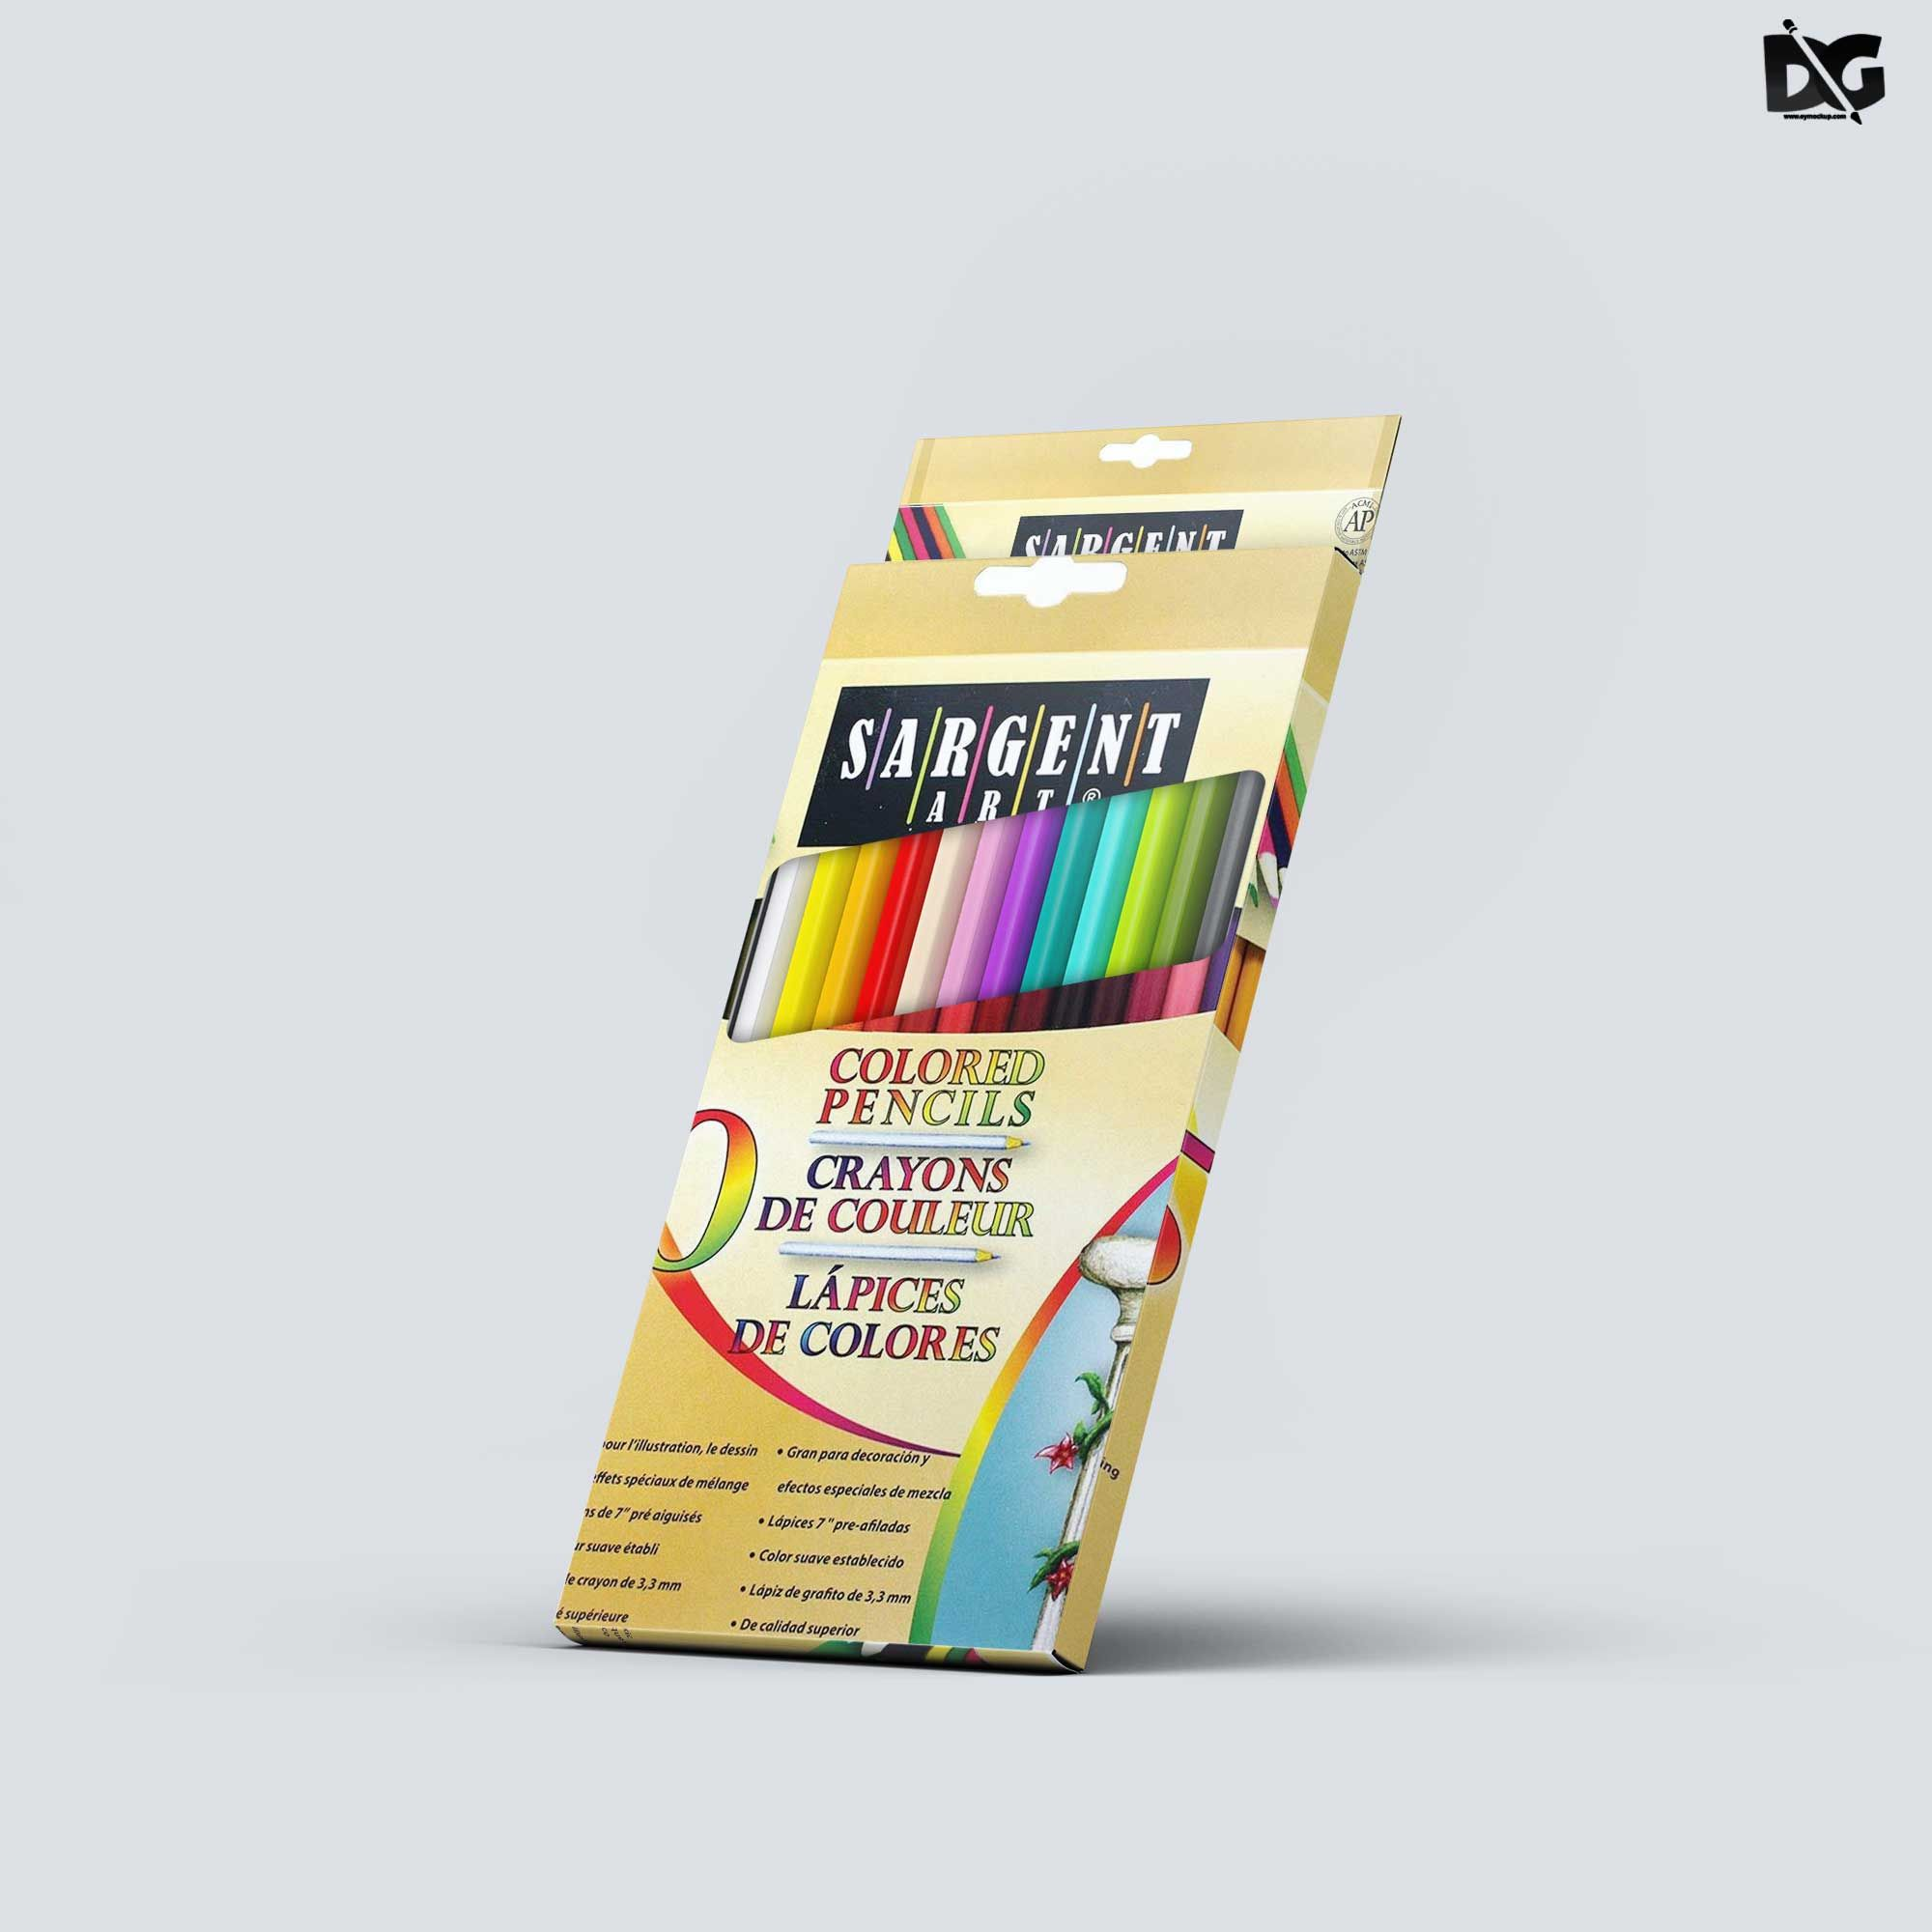 Download Free Pencil Box Label Design Mockup Designmockup Labeldesign Labeldesignmockup Labelmockup Packagingmockup Logo Design Mockup Mockup Design Label Design